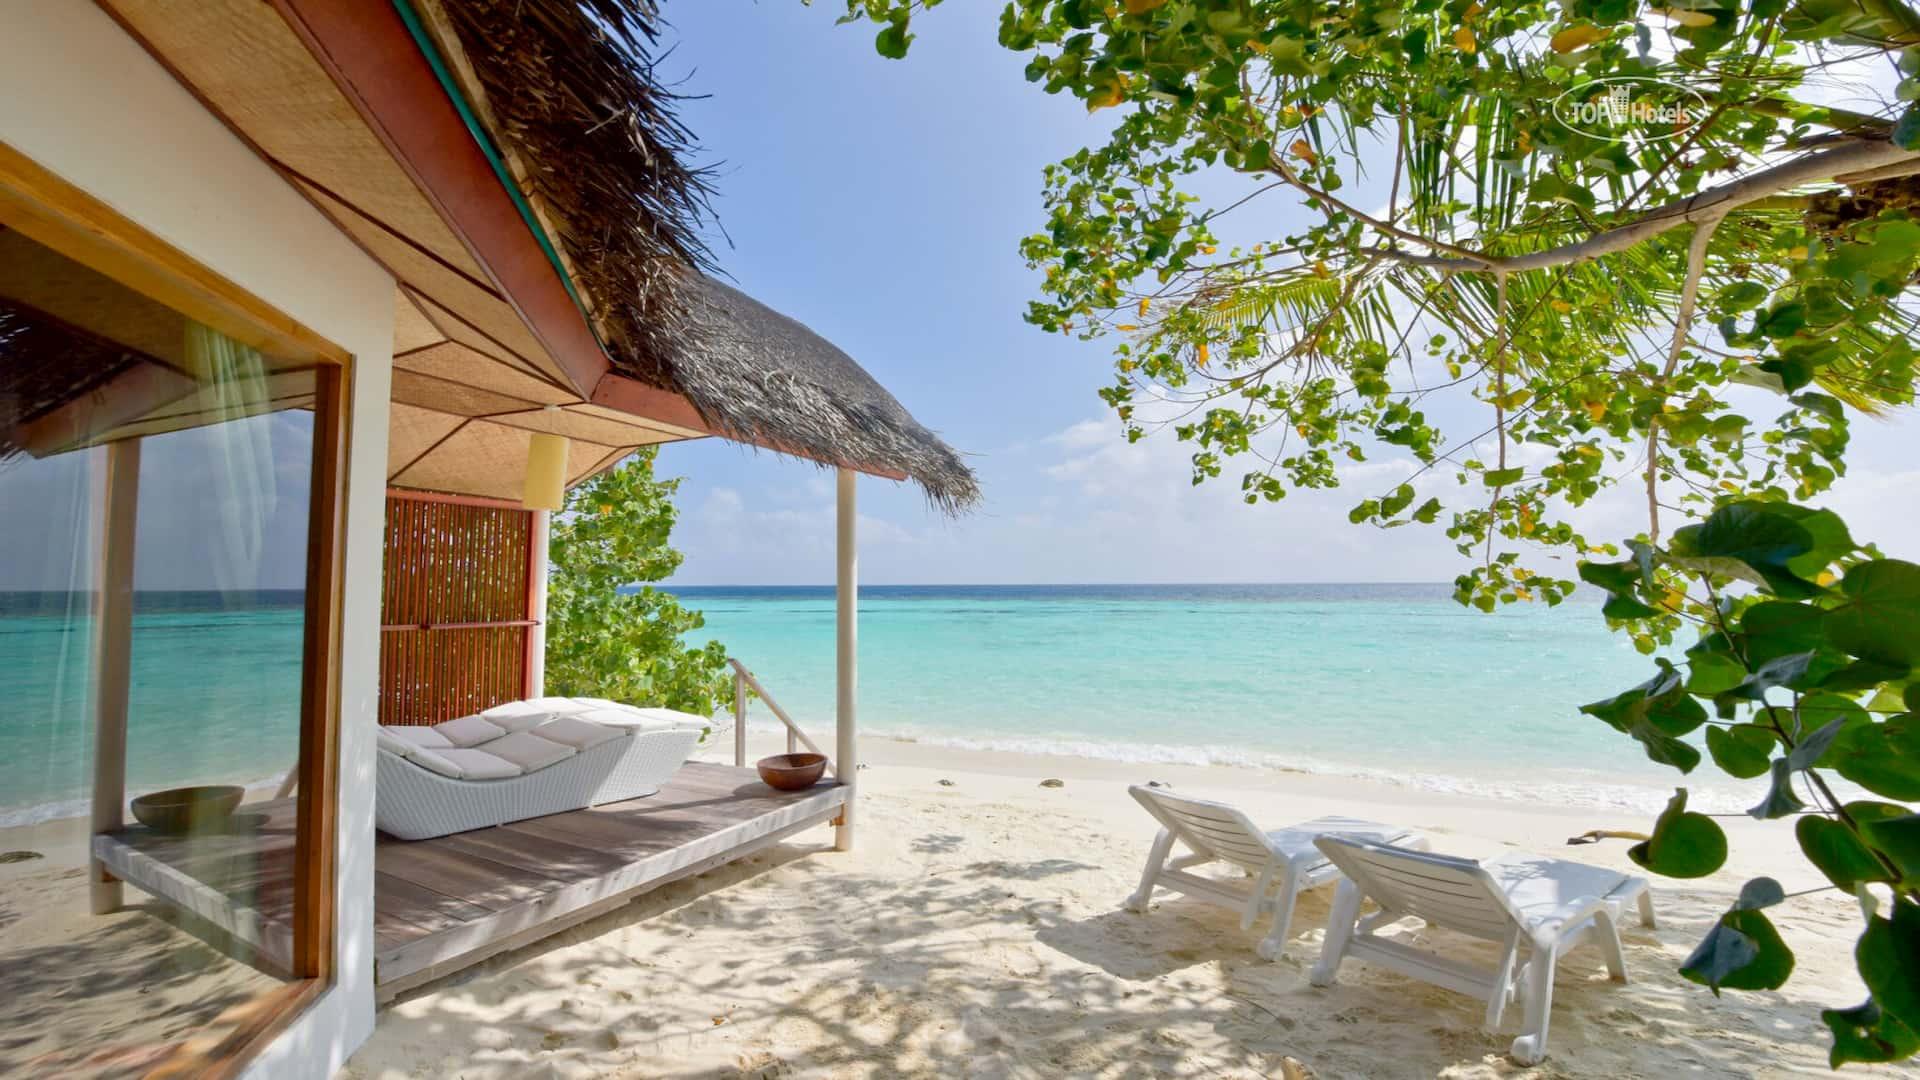 Resort Maldive Safari Island Resort Beach Bungalows